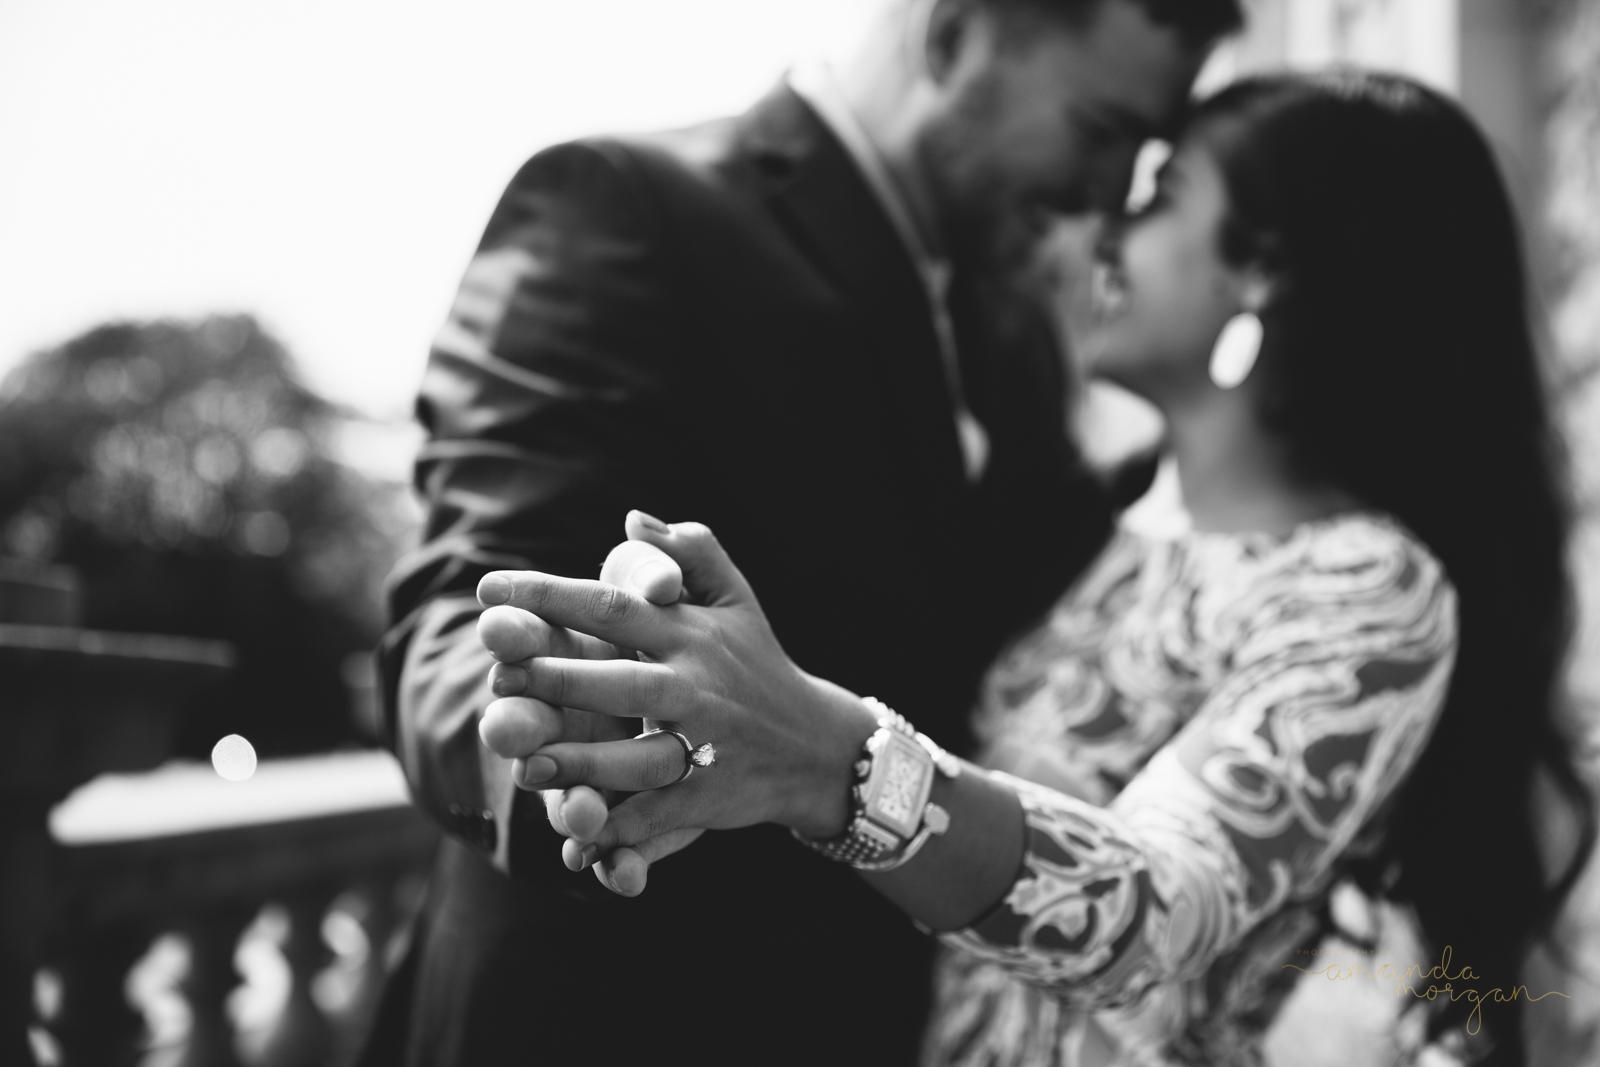 Surprise-Engagement-photos-amanda-morgan-27.jpg